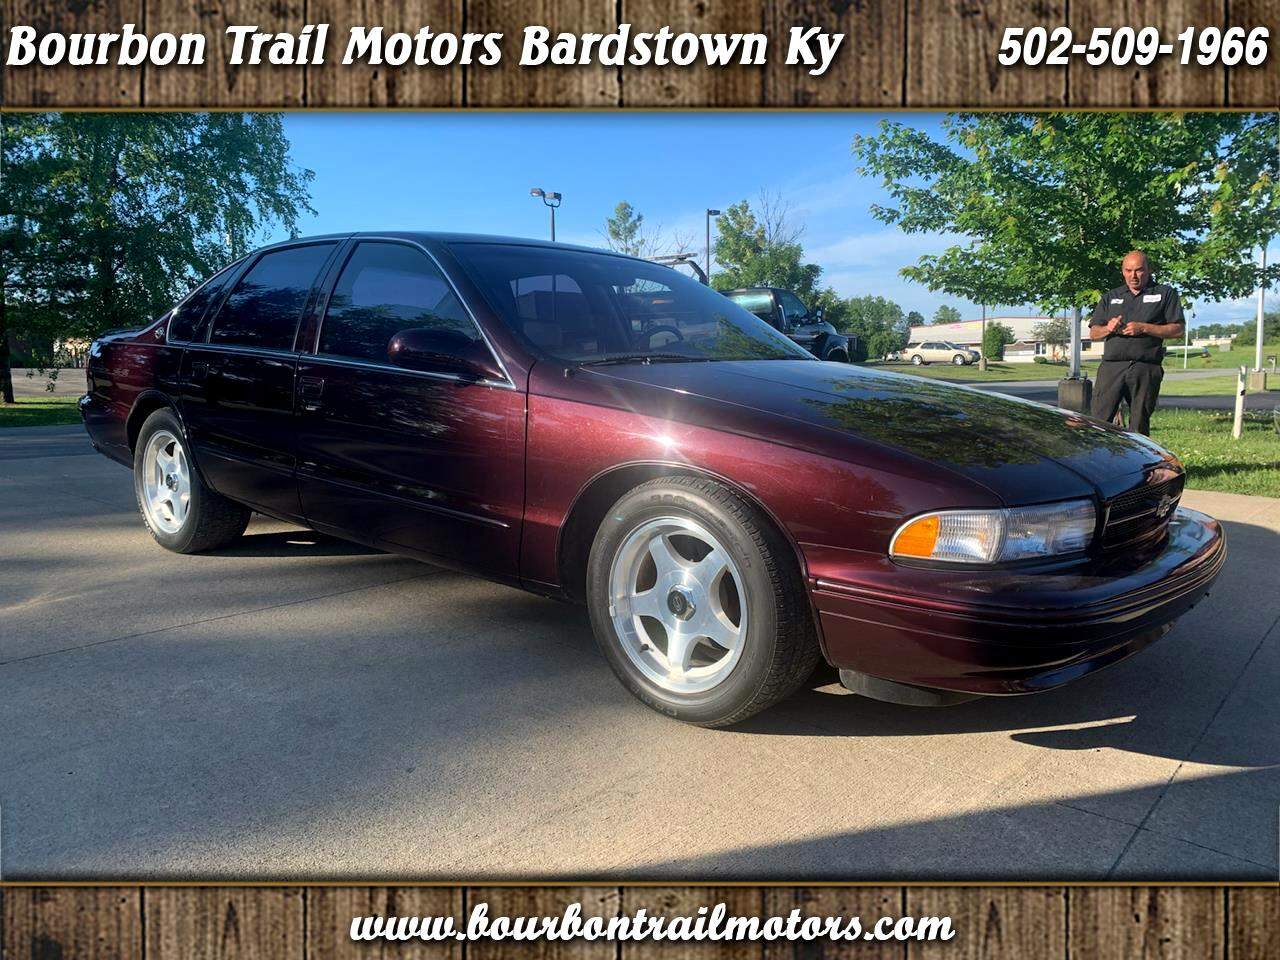 Chevrolet Caprice Classic/Impala SS/Caprice Police/Taxi Pkgs 4dr Sdn 1SA Special Value Pkg 1996